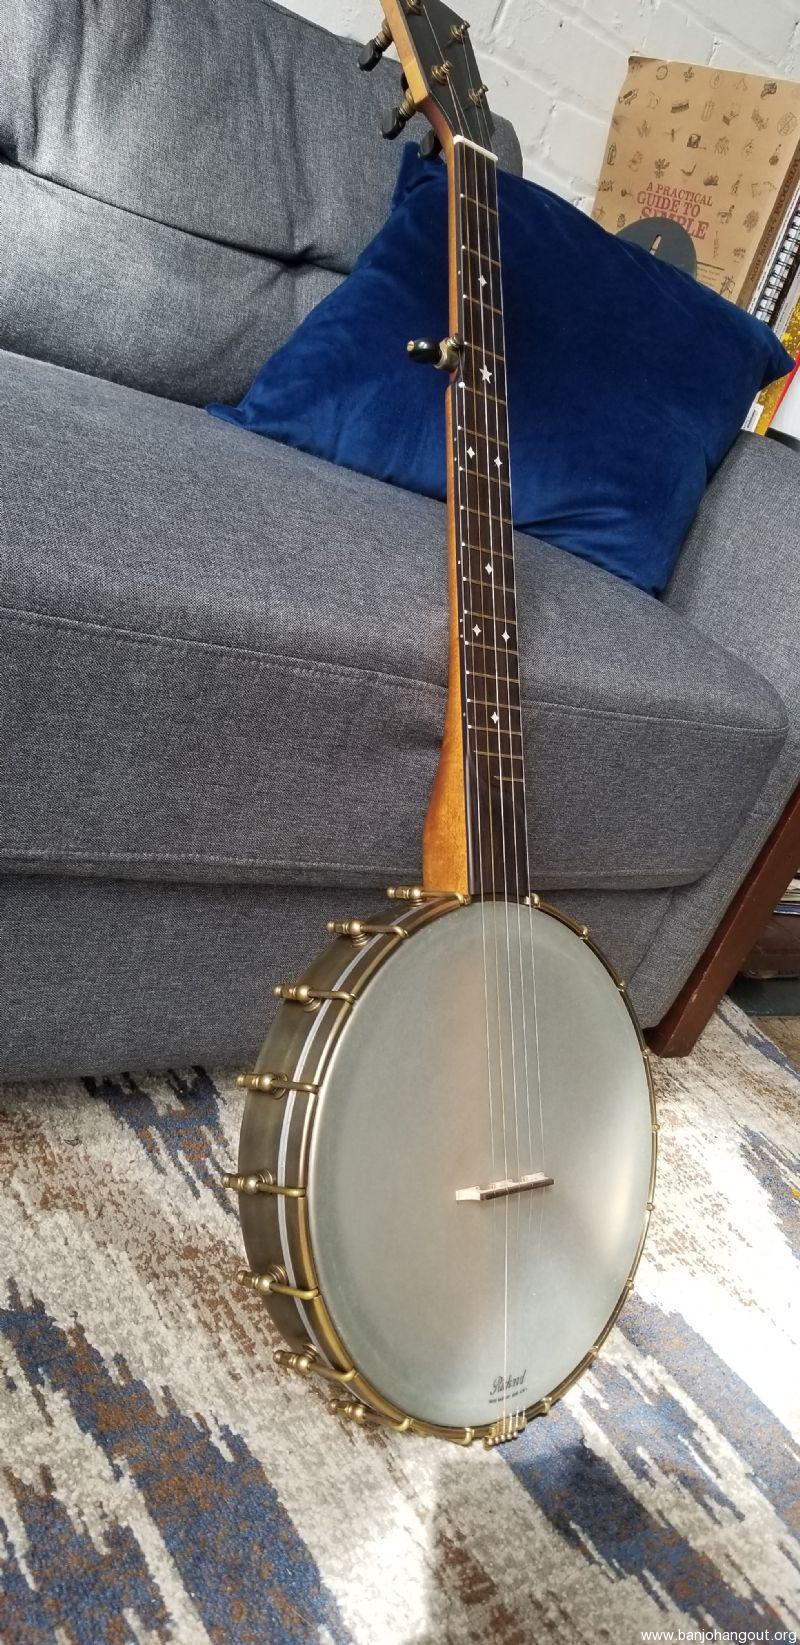 SOLD: Rickard 12 dobson Spunover Brass Rim - Banjo Hangout